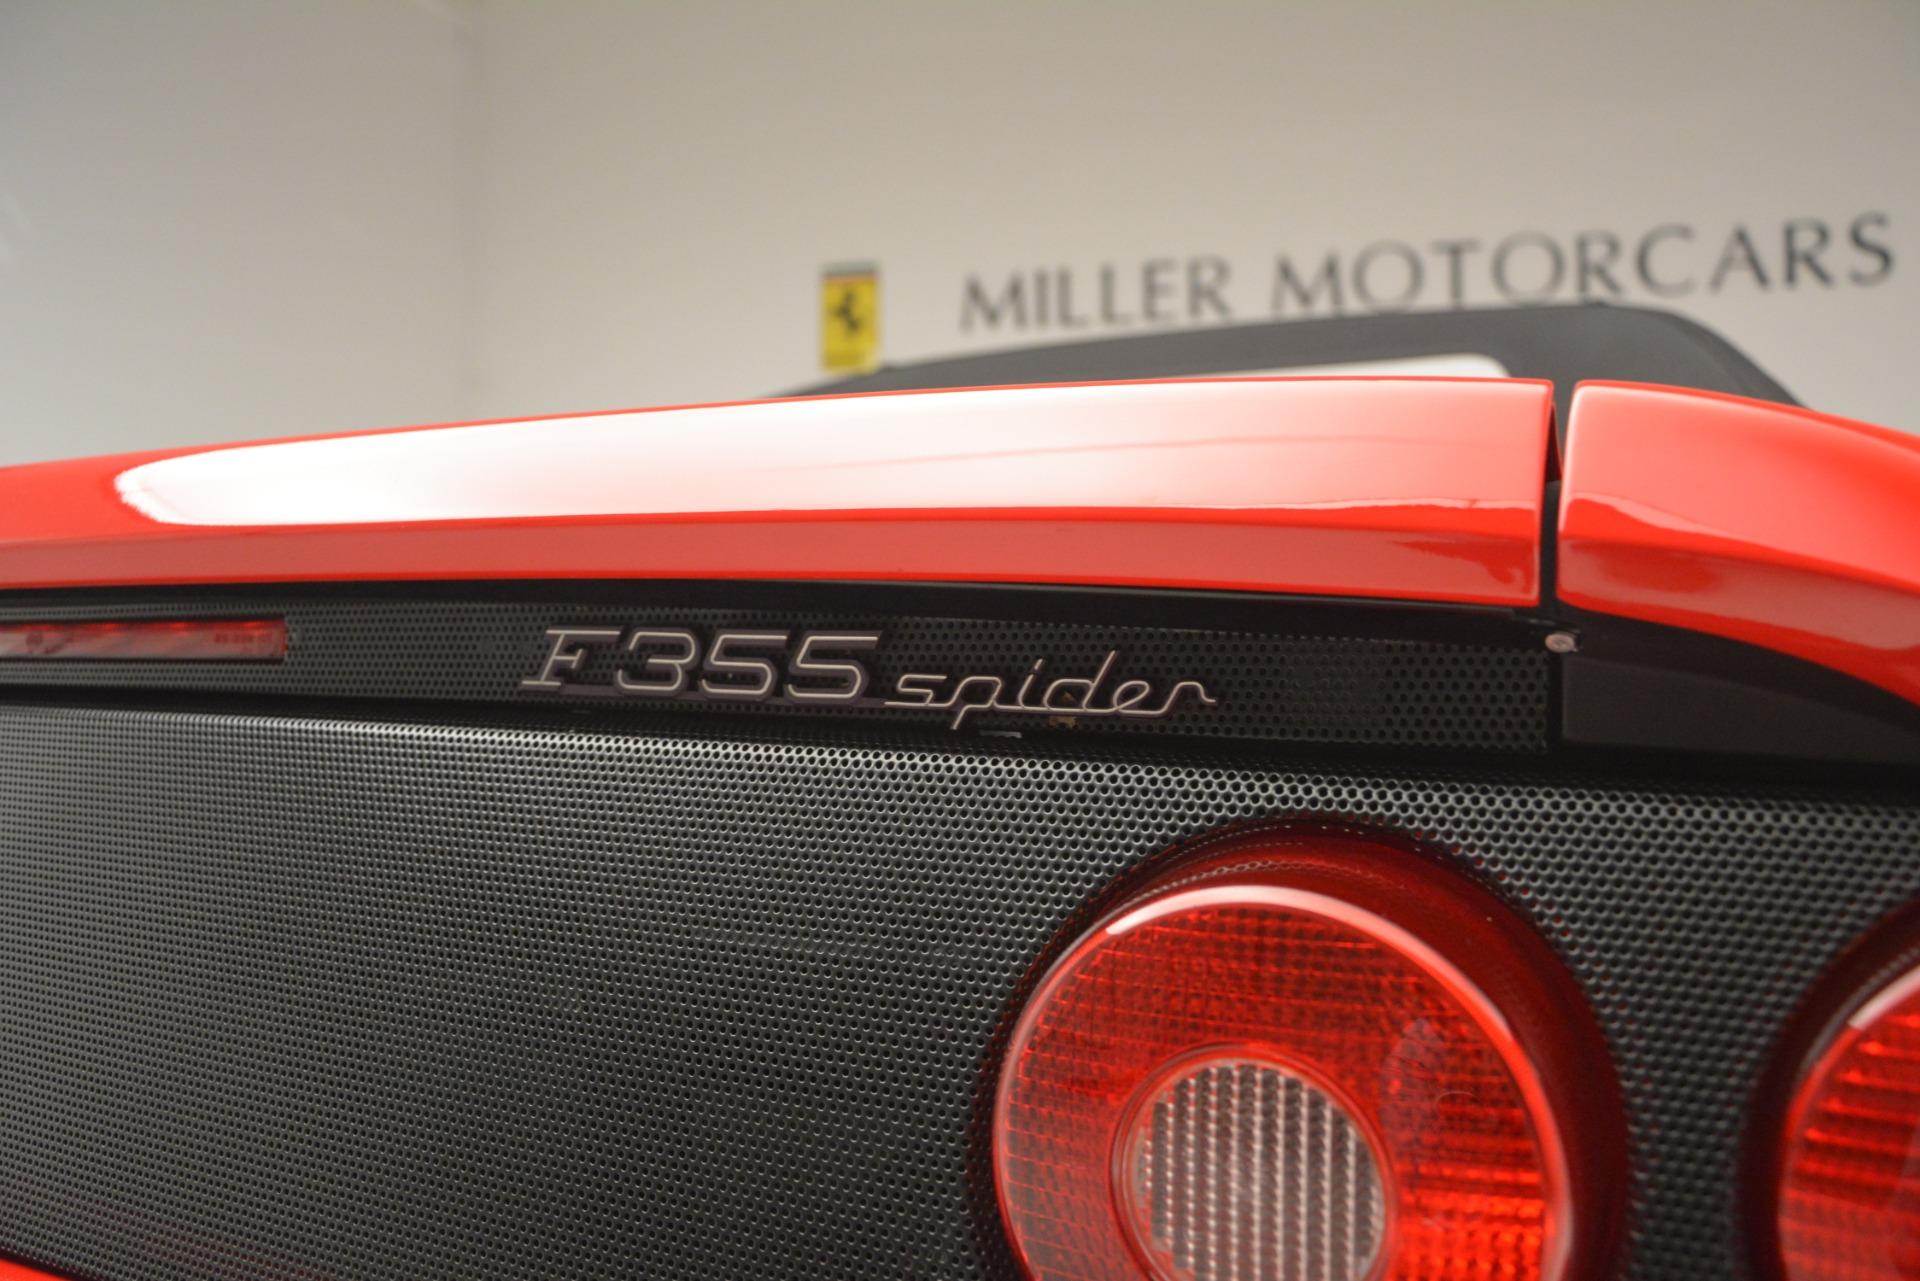 Used 1997 Ferrari 355 Spider 6-Speed Manual For Sale In Westport, CT 2735_p27